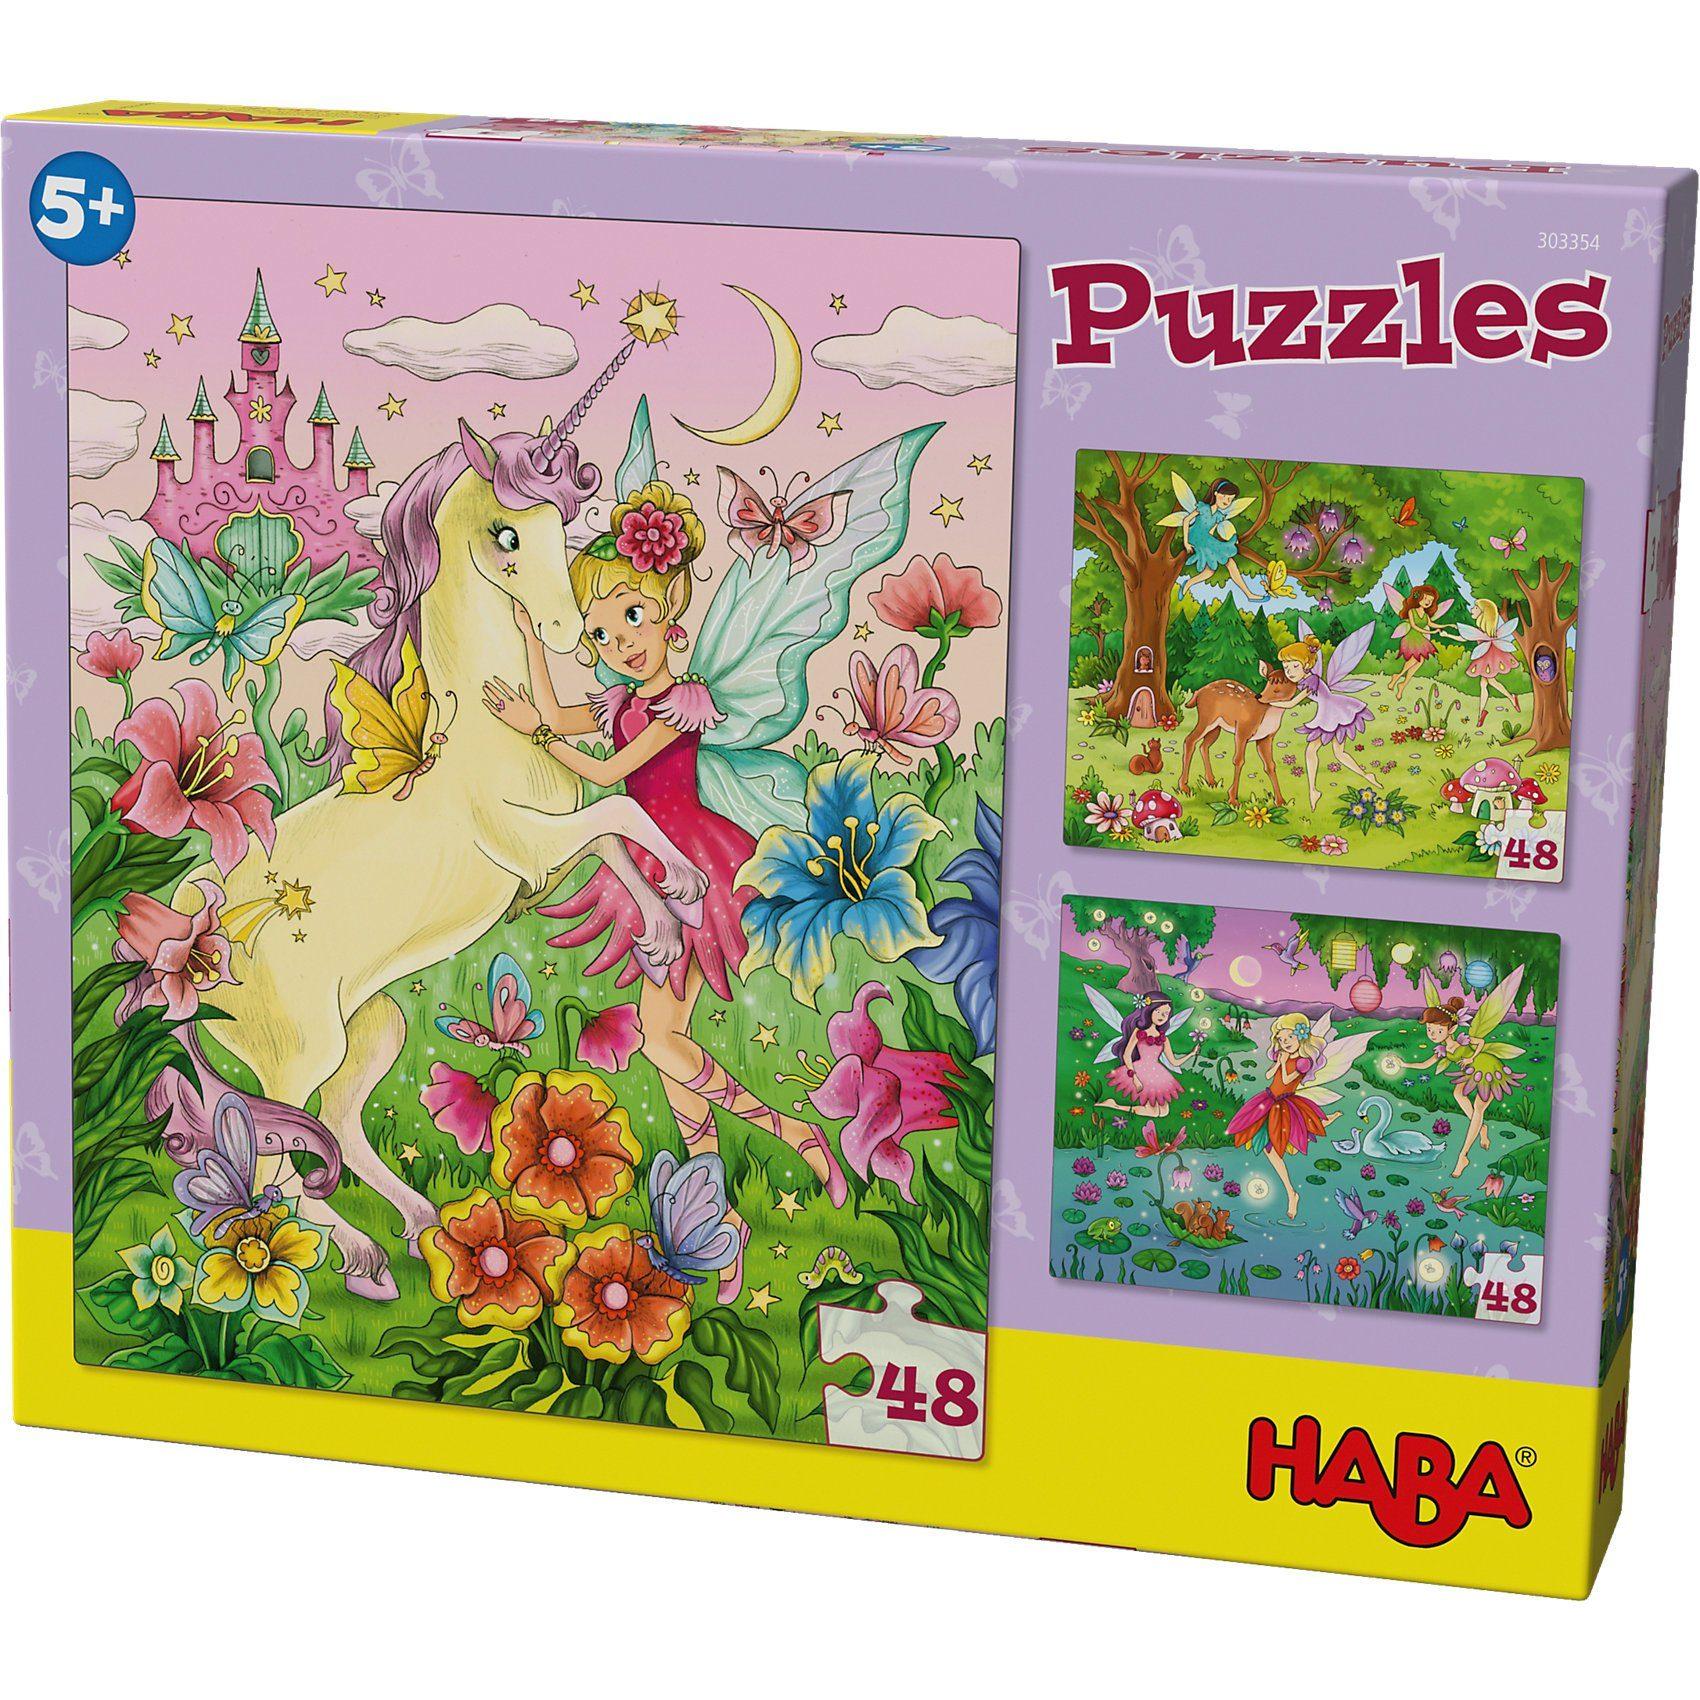 Haba Puzzles - 3 x 48 Teile - Feenzauber